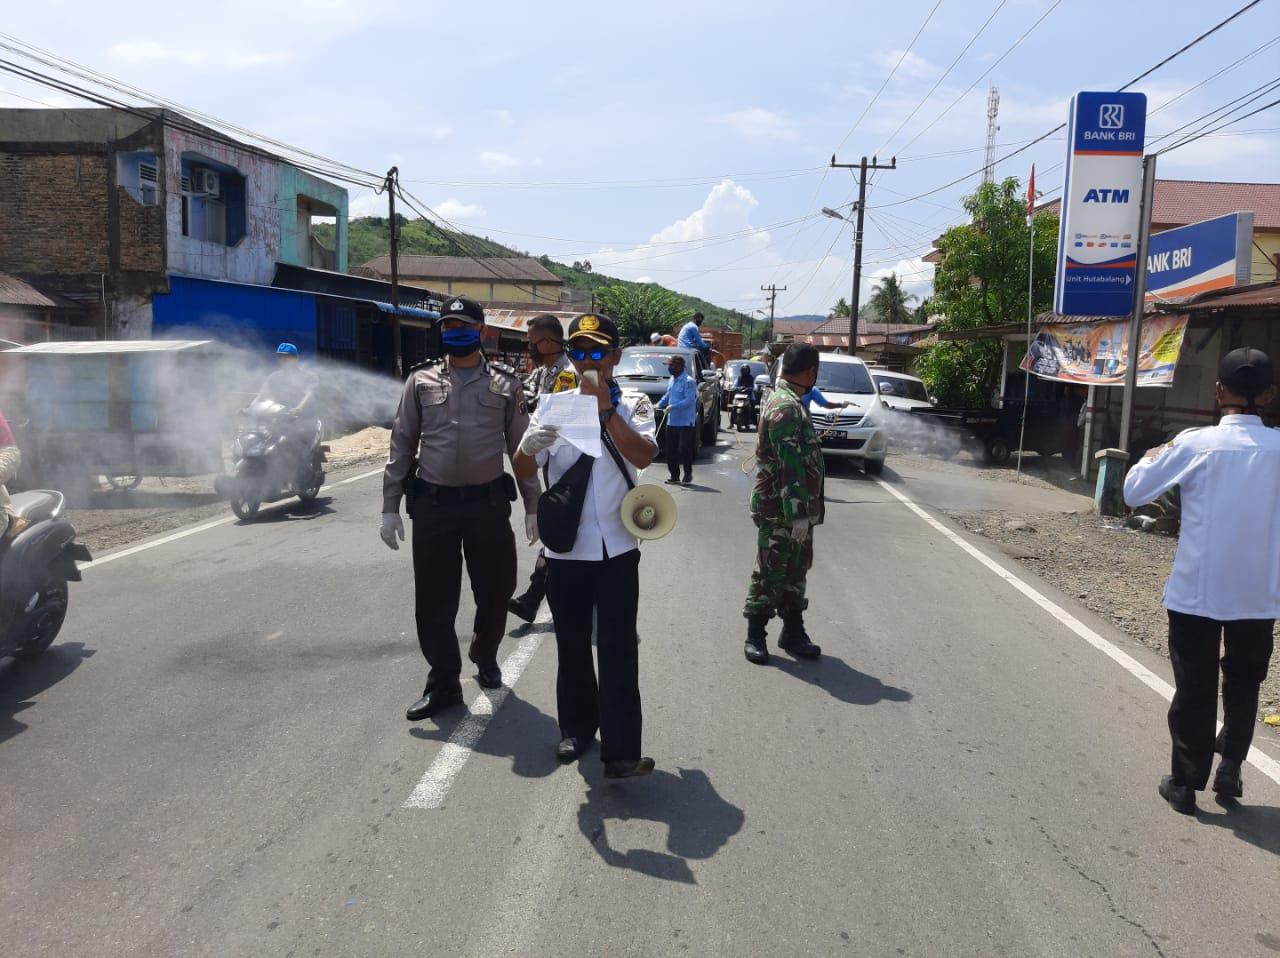 Laksanakan Intruksi Bupati, Kecamatan Badiri Semprot Cairan Disinfektan